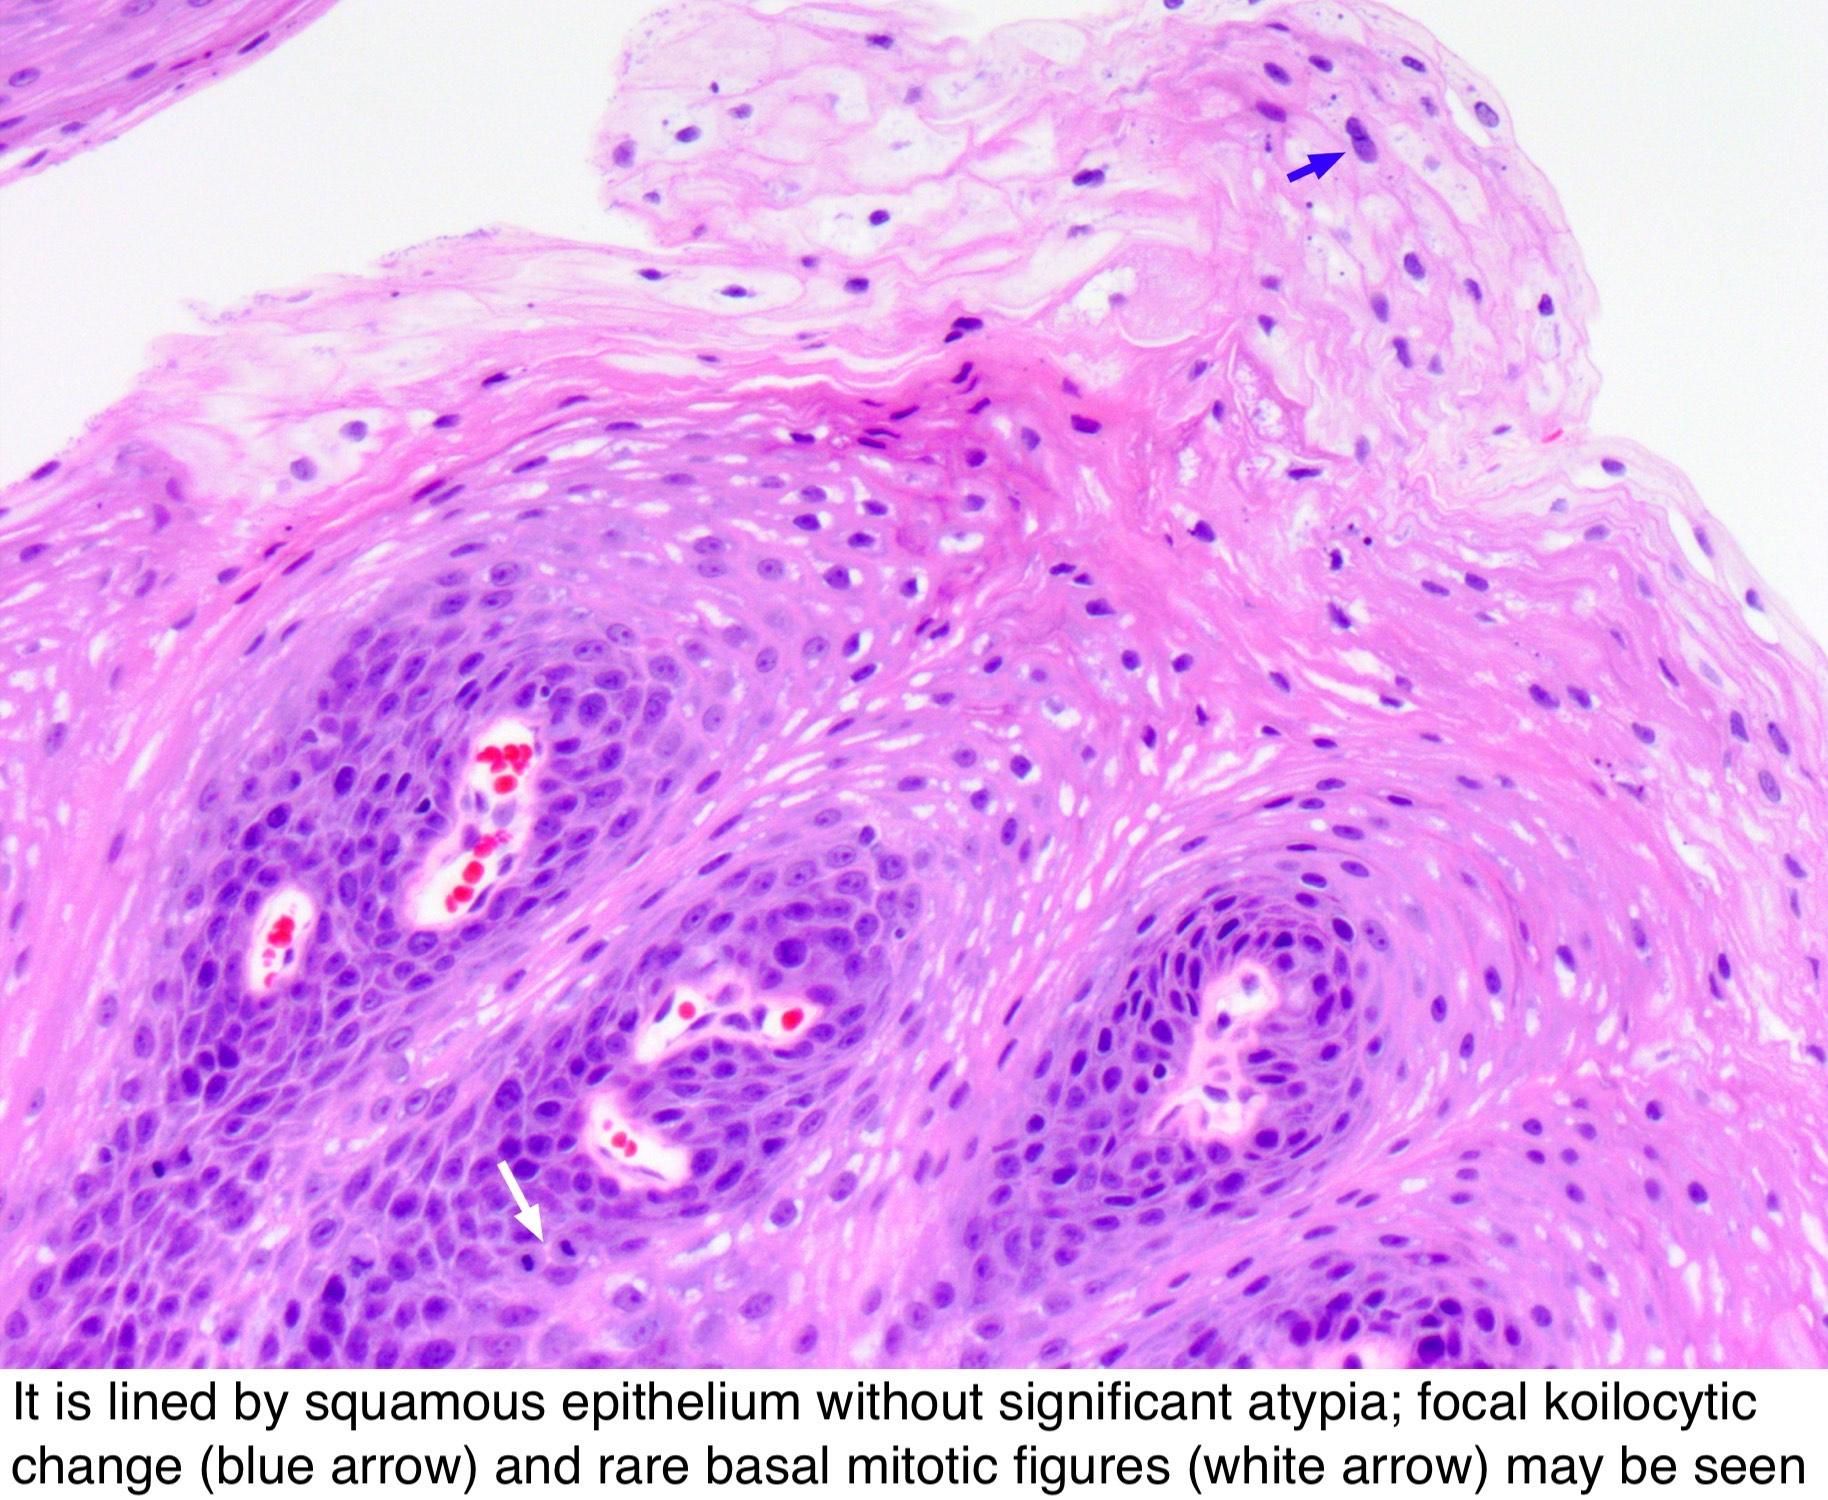 cancer genetic instability epidermal papillomatosis icd 10